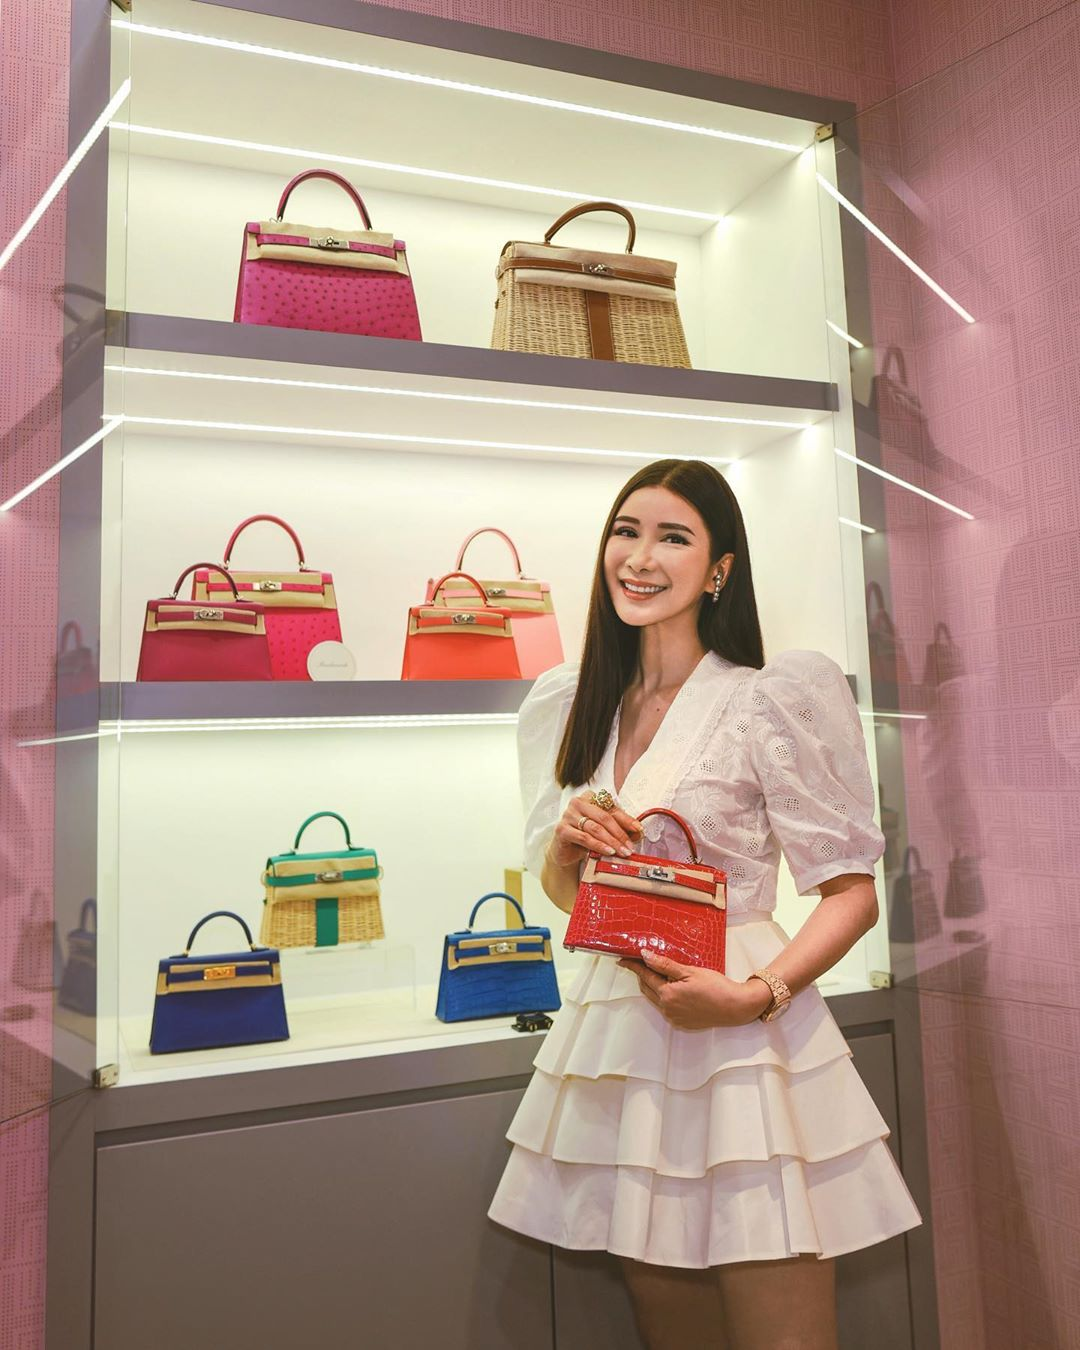 Джейми Чуа скупила сумки на 2 миллиона долларов